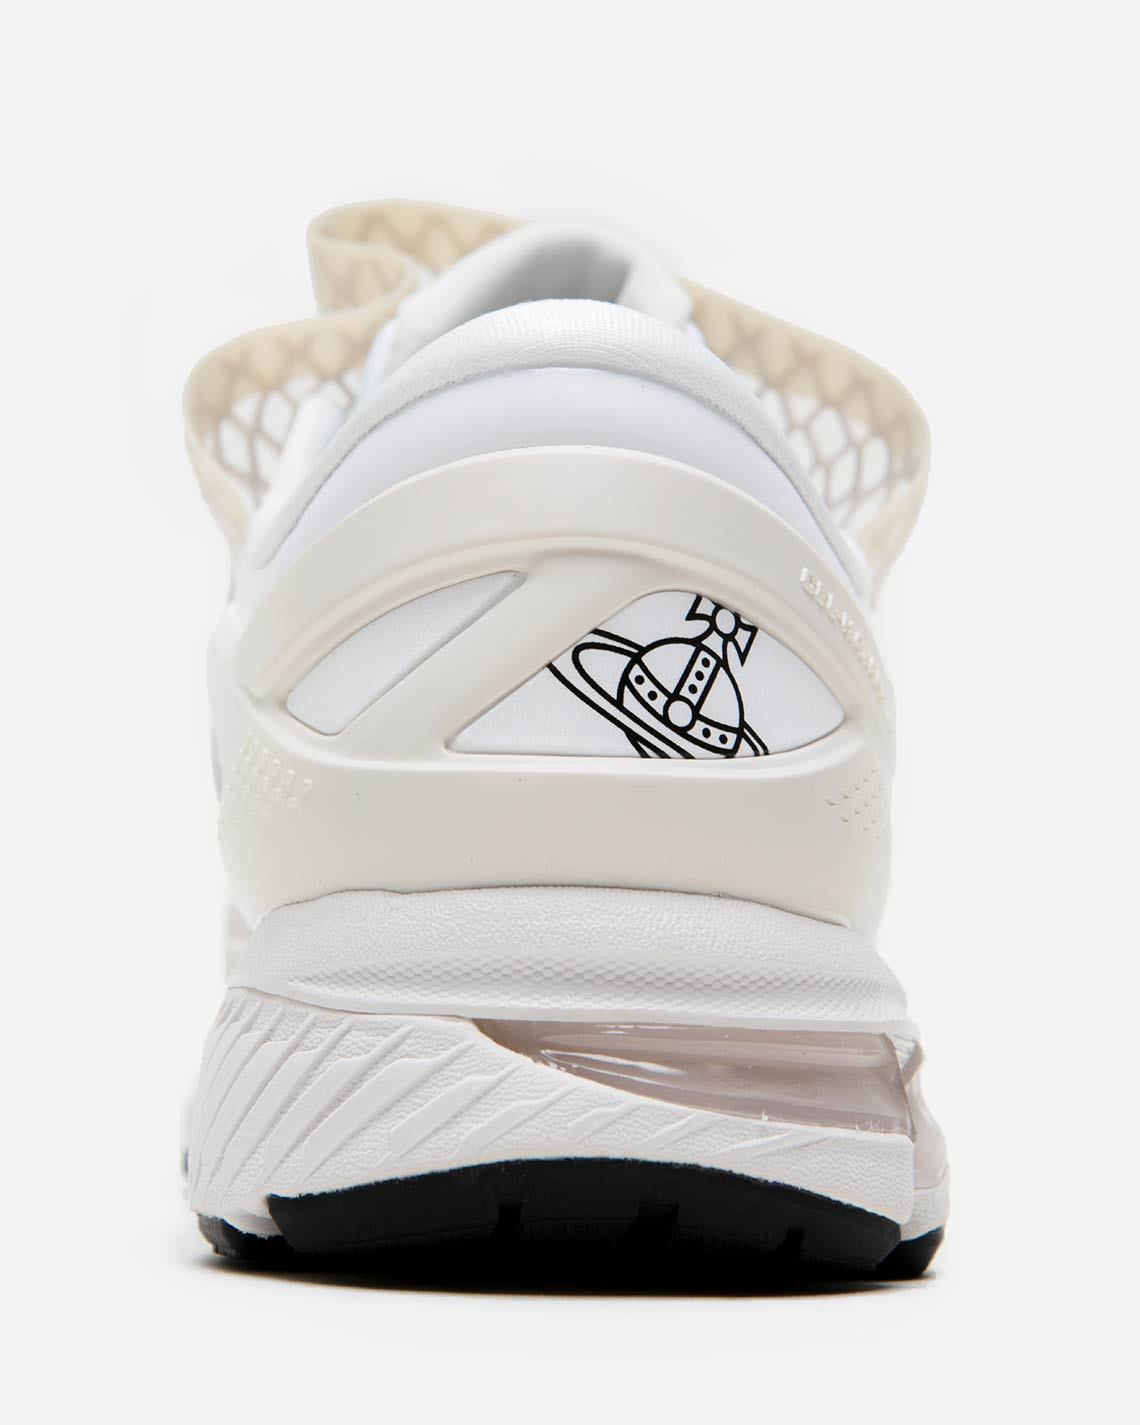 giày thể thao (21-28.9.2020)- ASICS GEL KAYANO 26 (19)